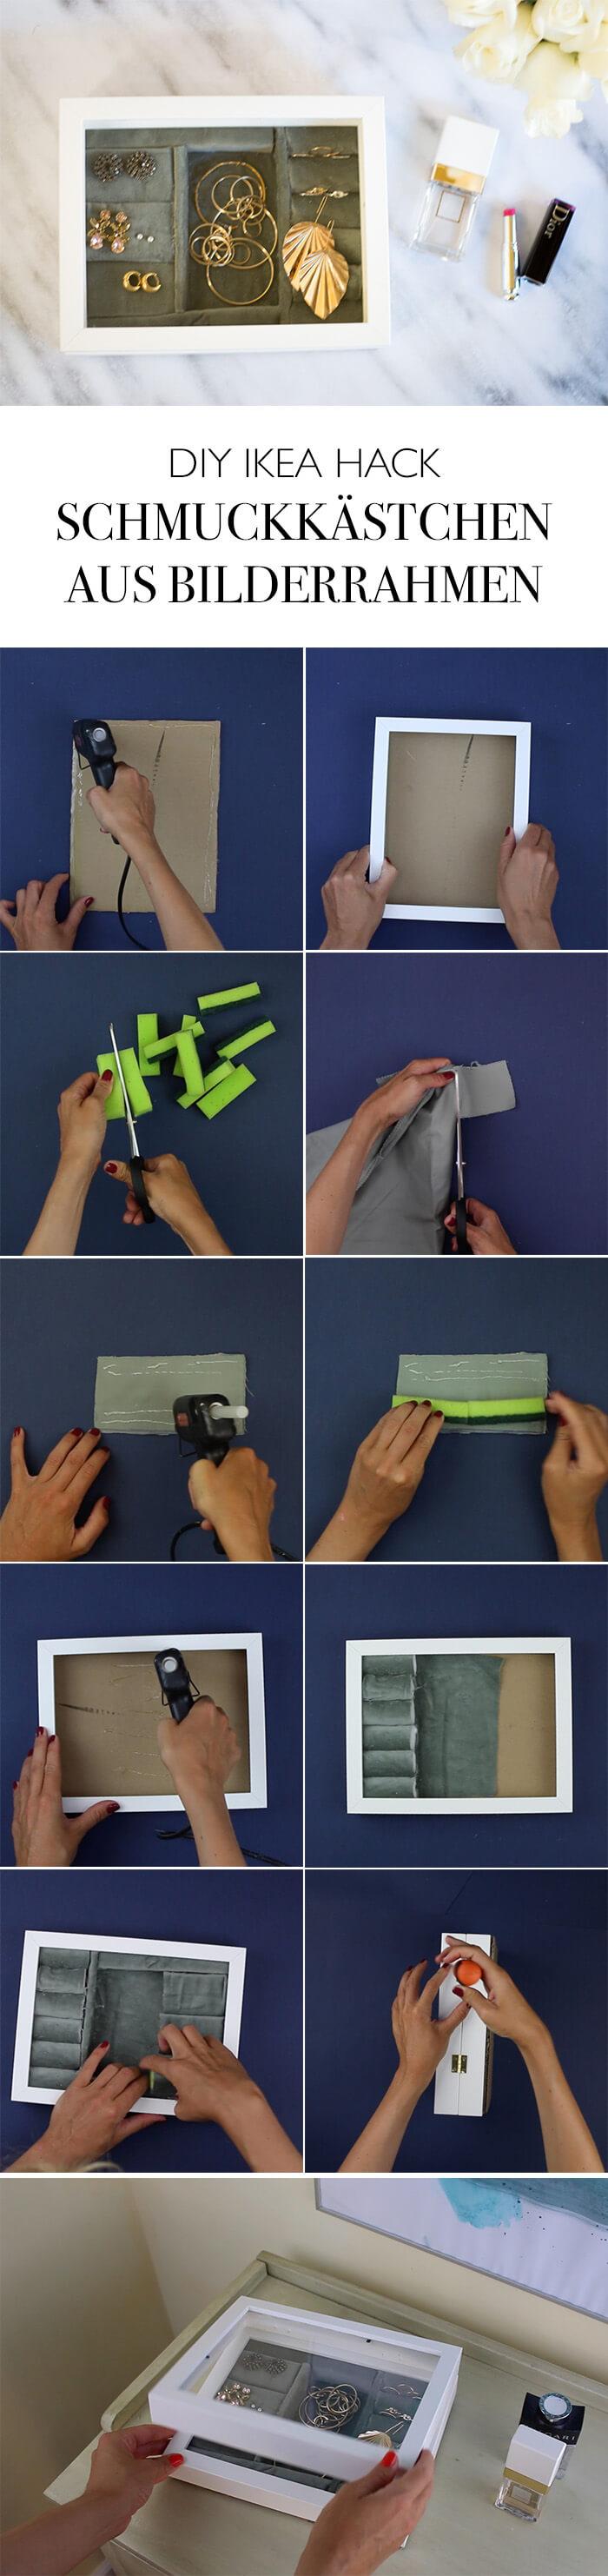 DIY Ikea Hack Bilderrahmen Schmuckkästchen selber machen Schmuckaufbewahrung DIY Deko Blog lindaloves